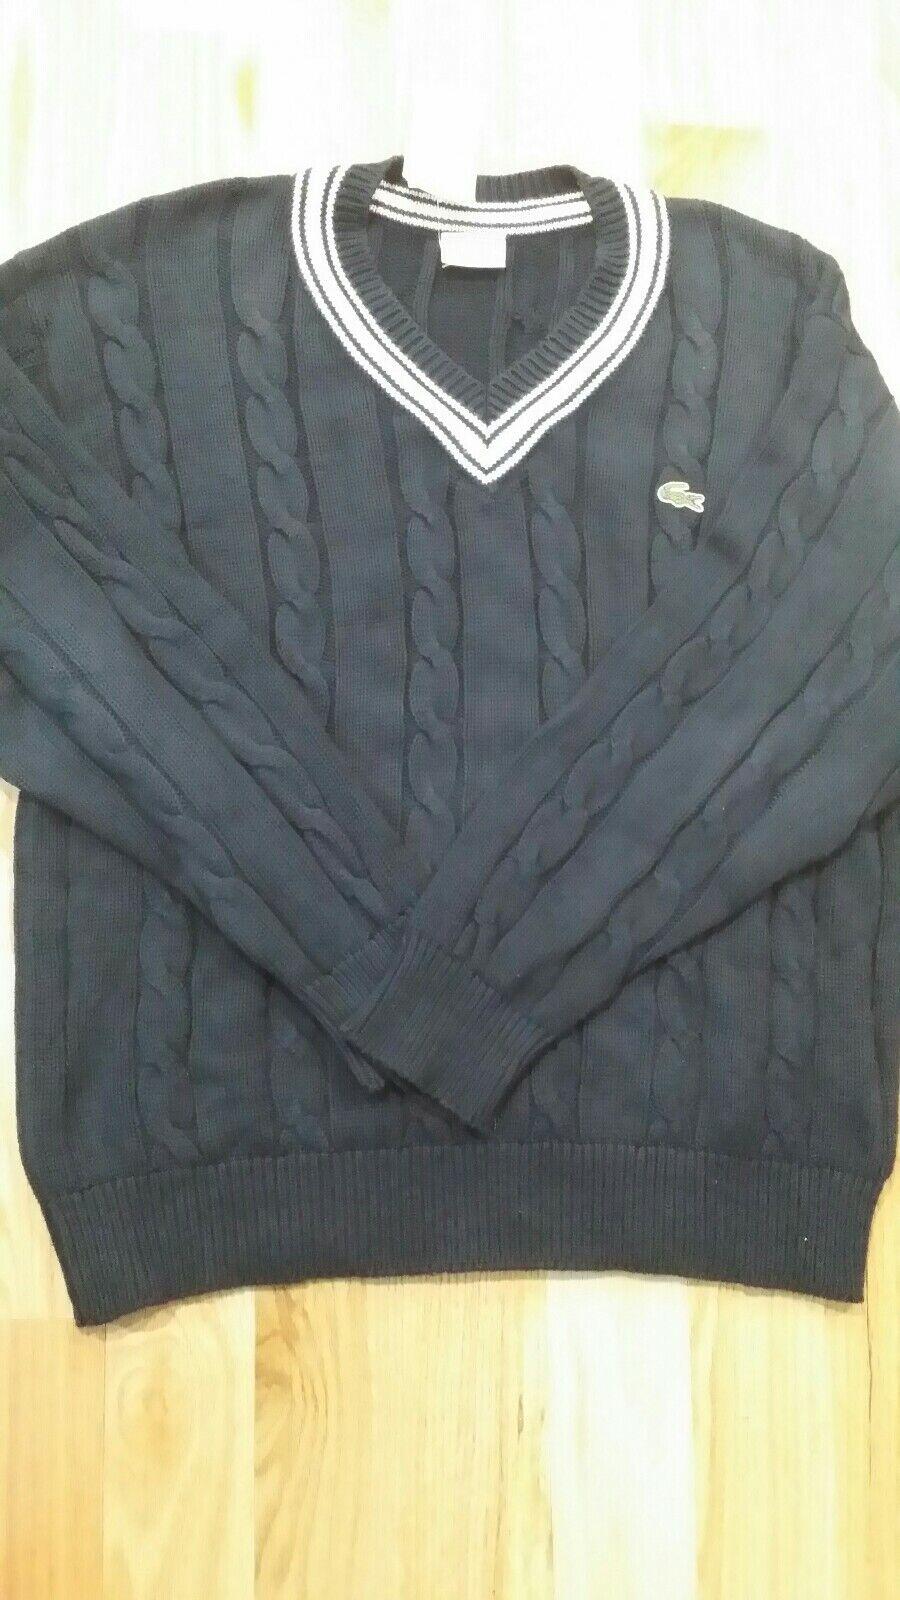 VIntage Lacoste Sport bluee Sweater Size L Long sleeves